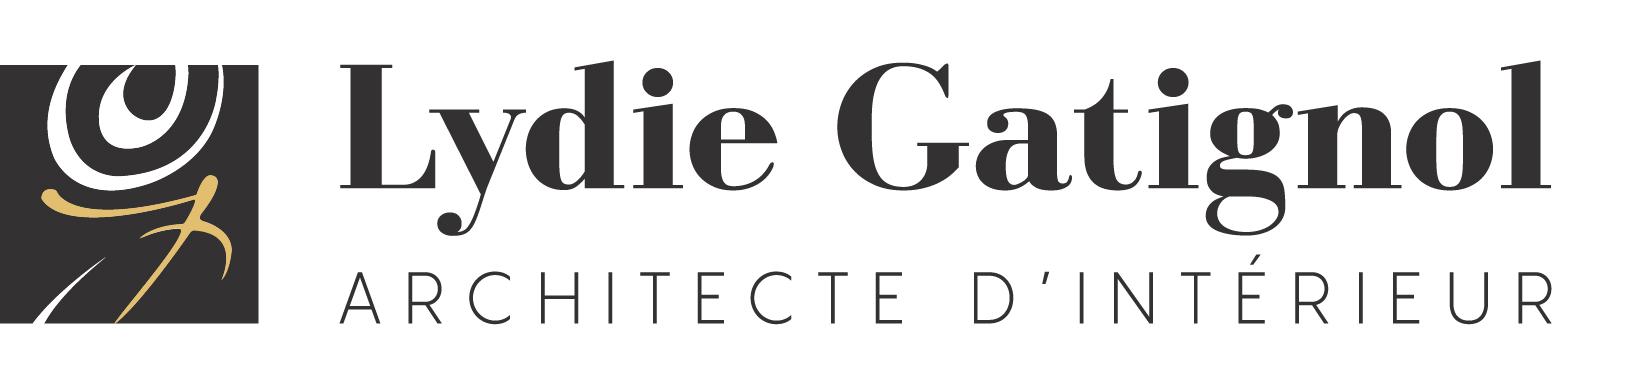 Lydie Gatignol